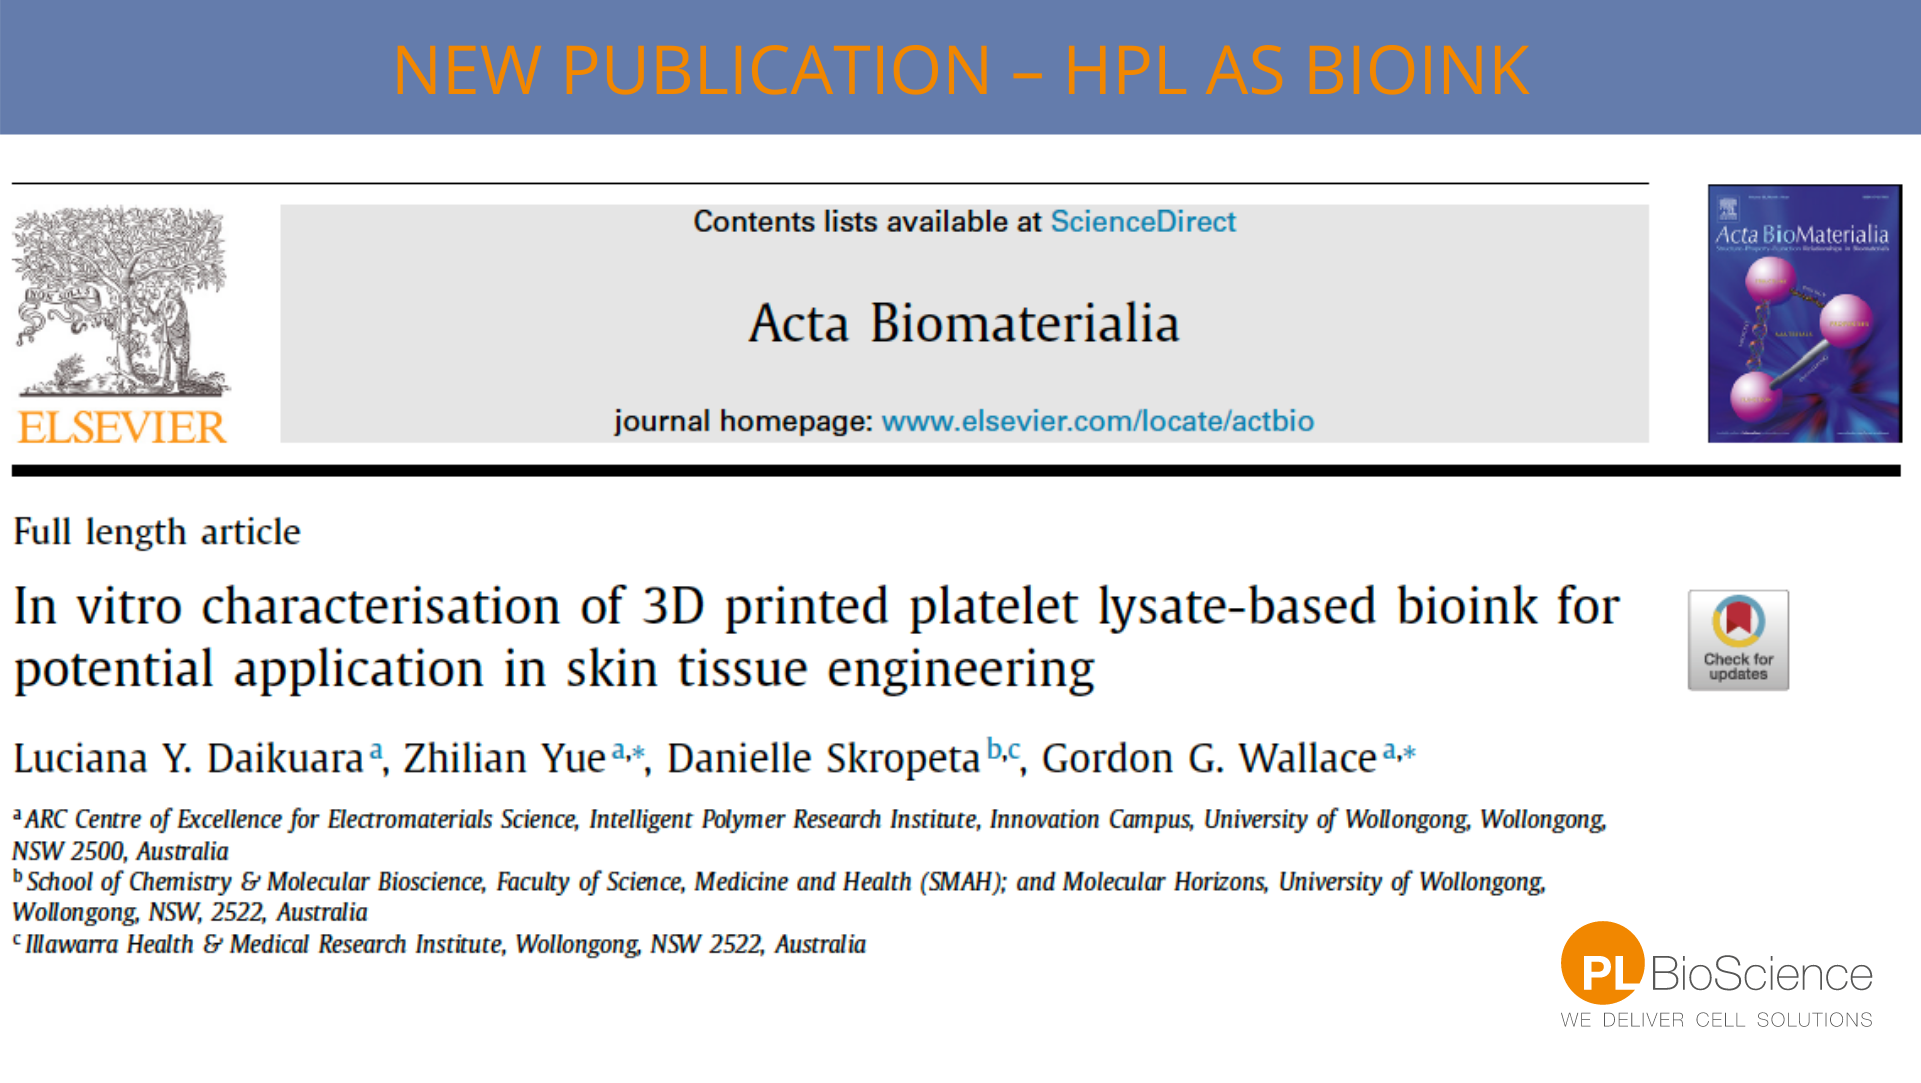 Human Platelet Lysate as bioink for 3D bio-printing